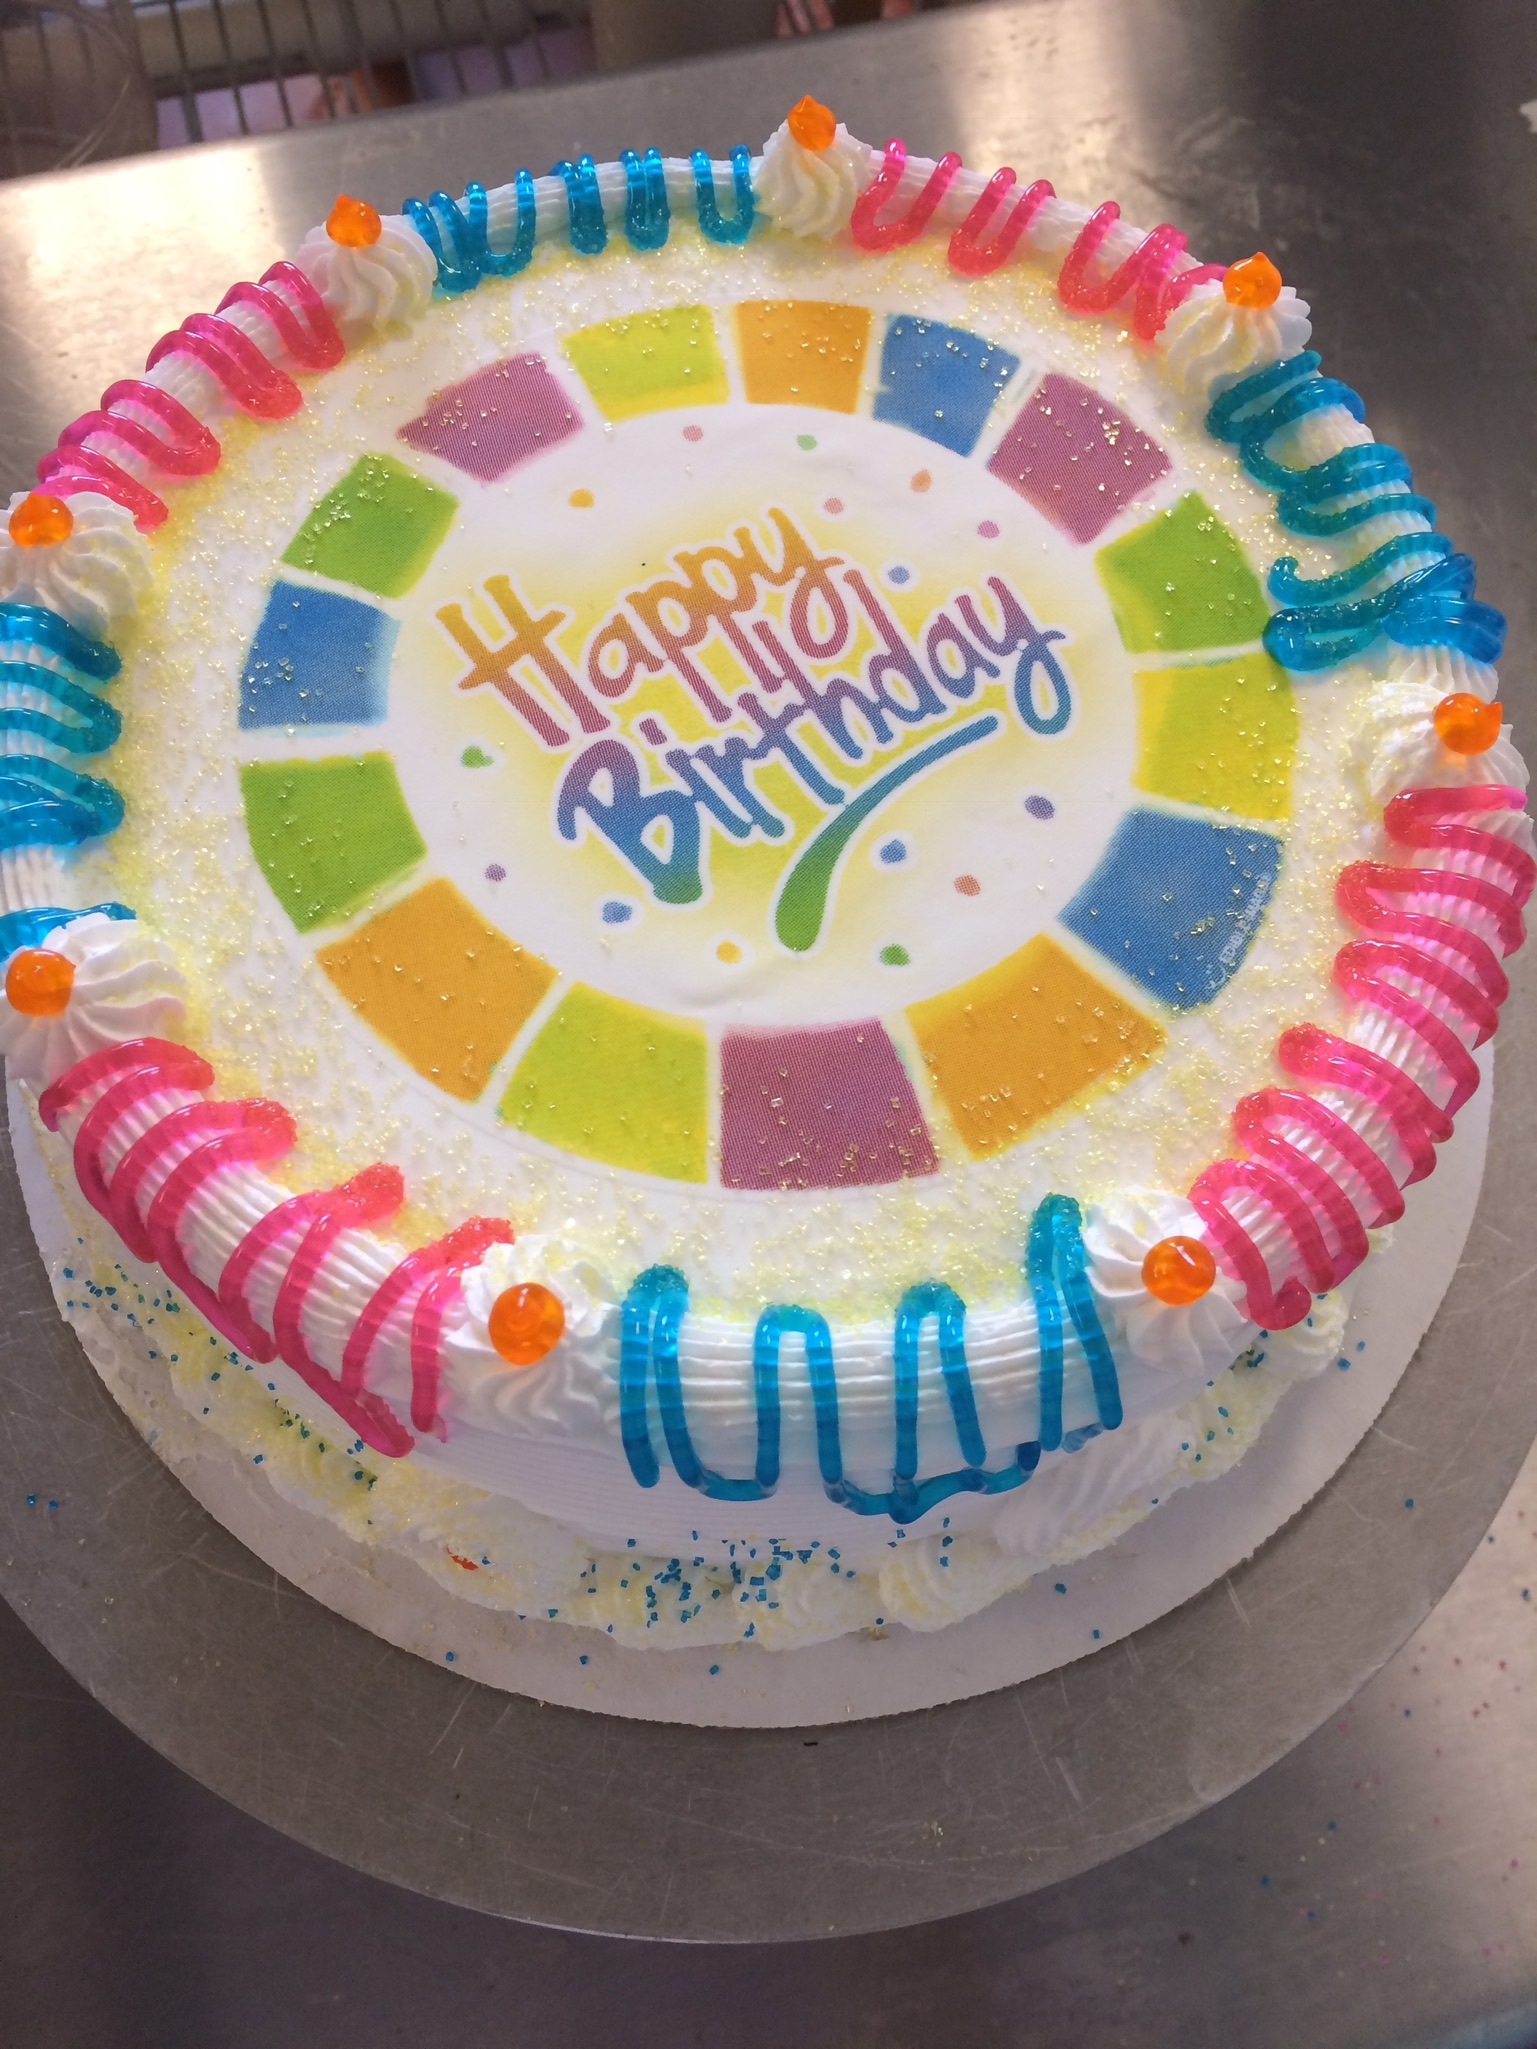 Cake Design #8